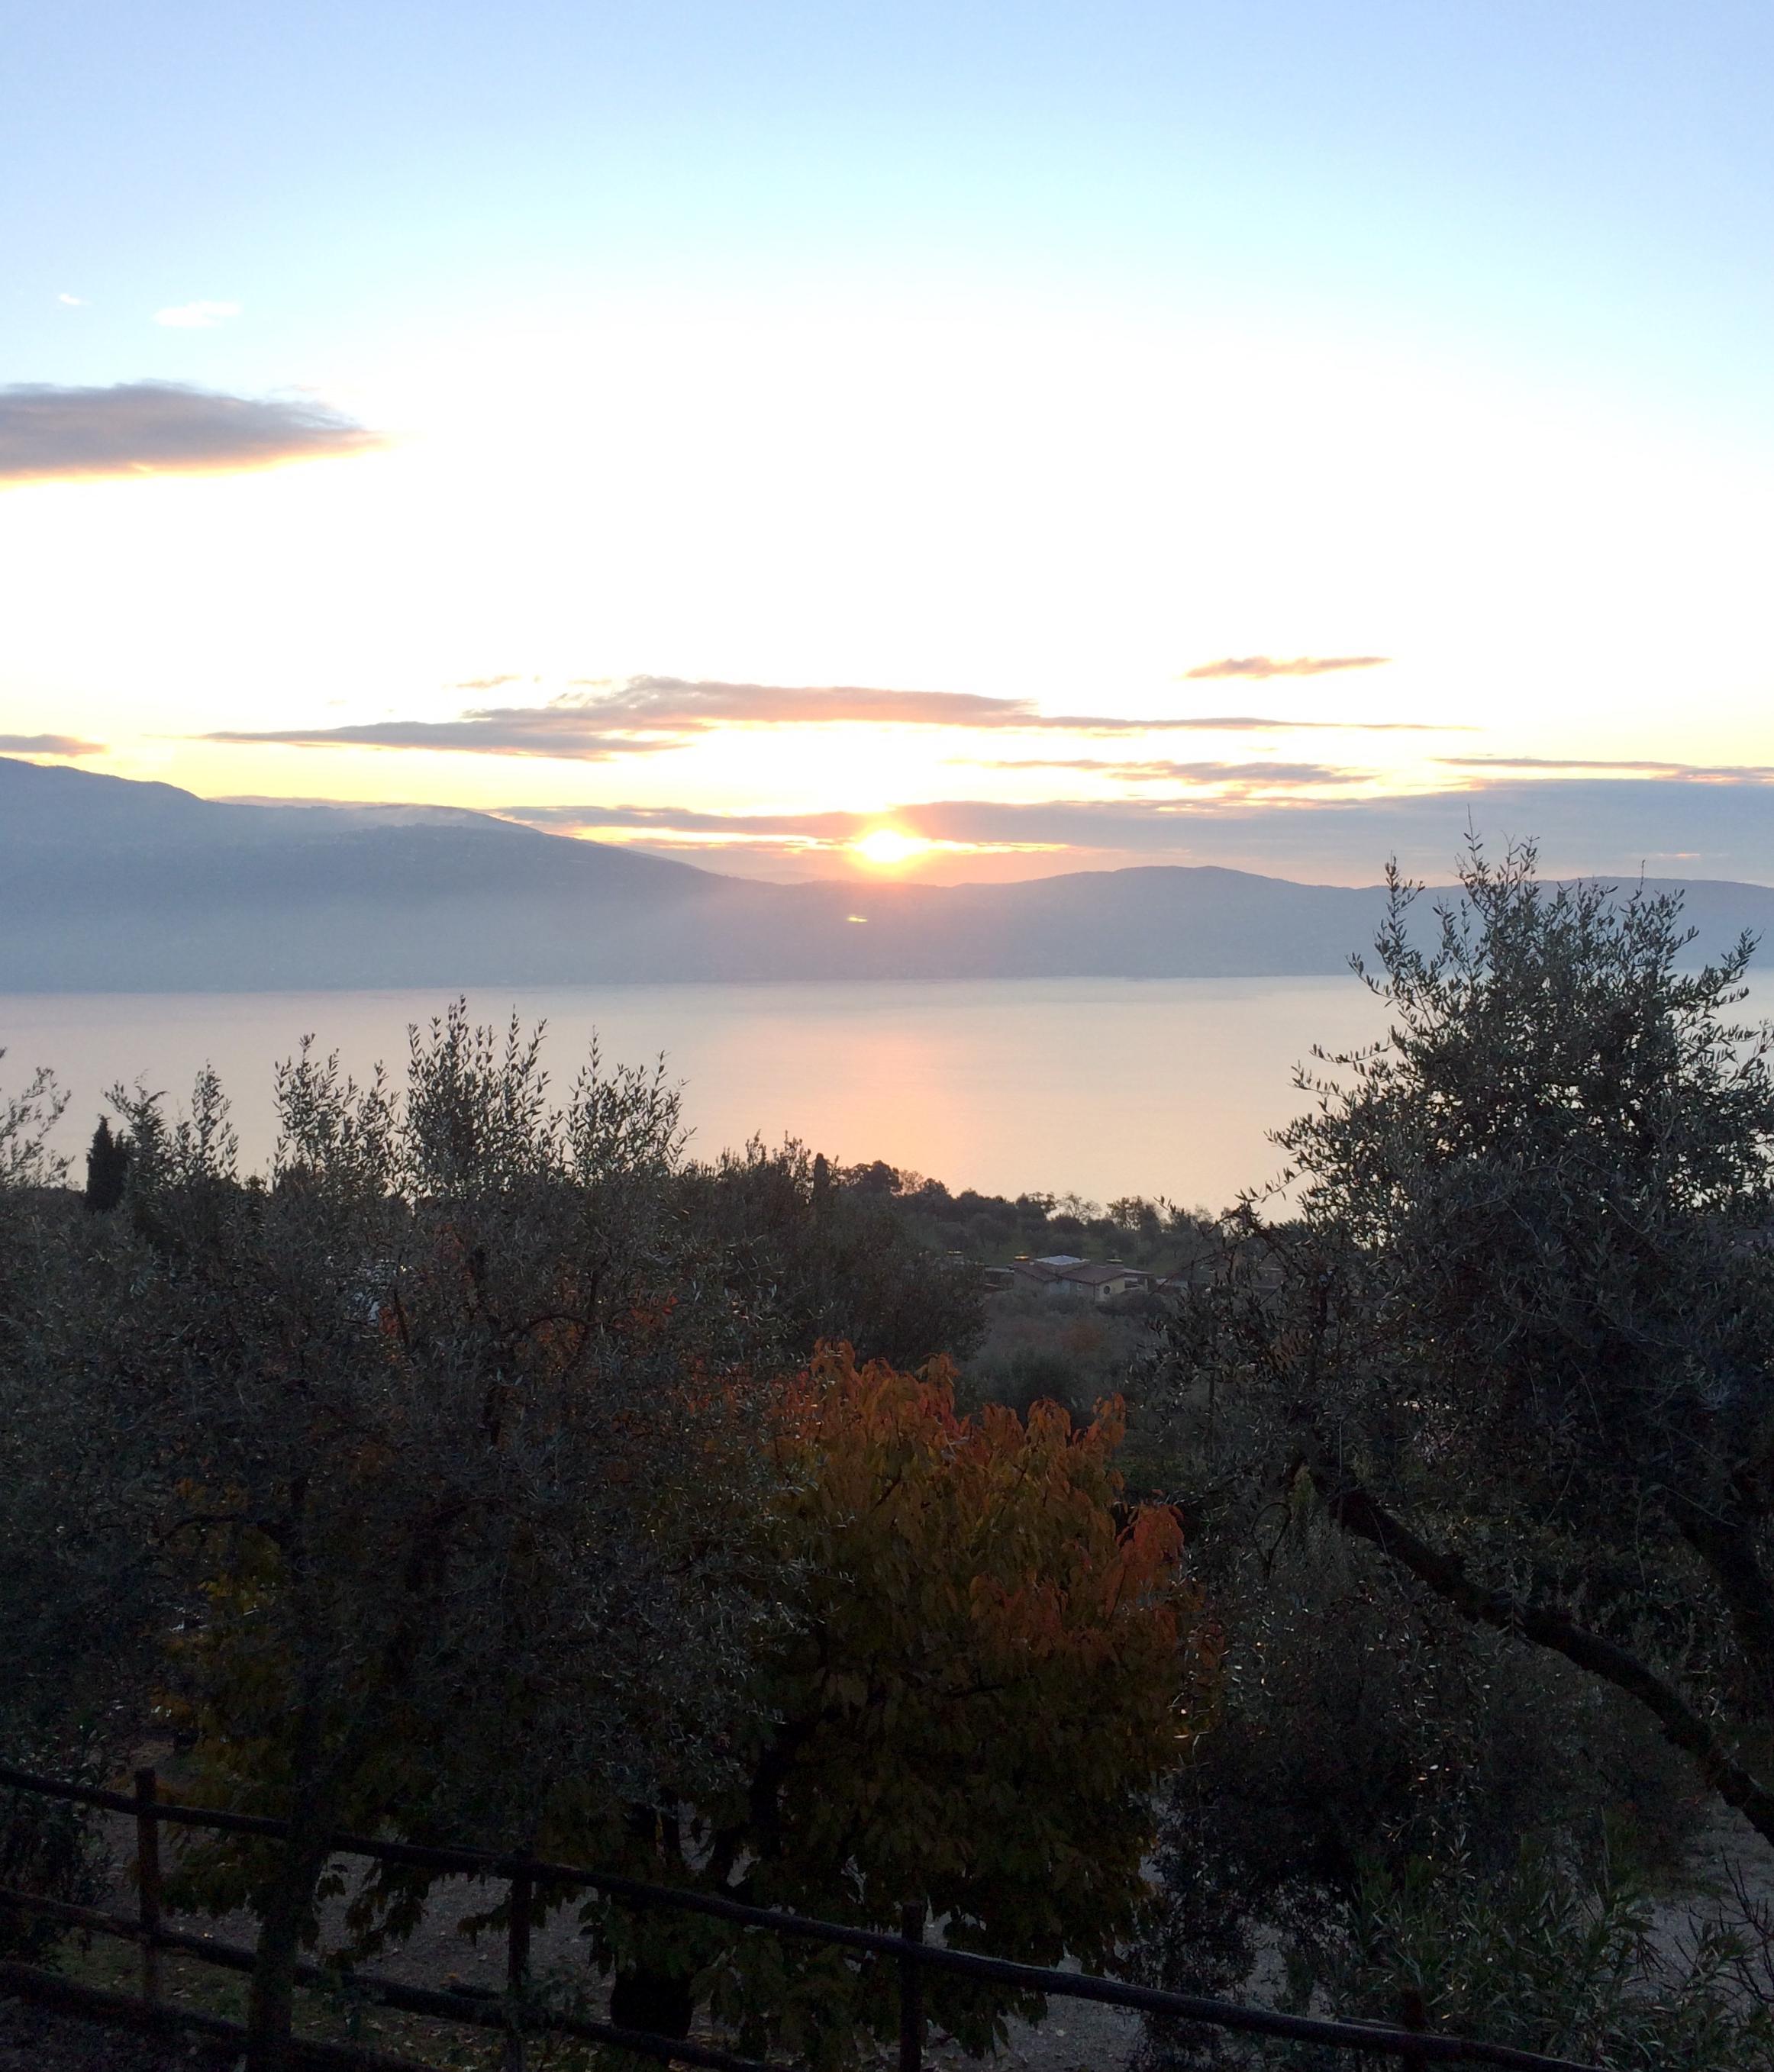 sunrise-scuderia.jpg